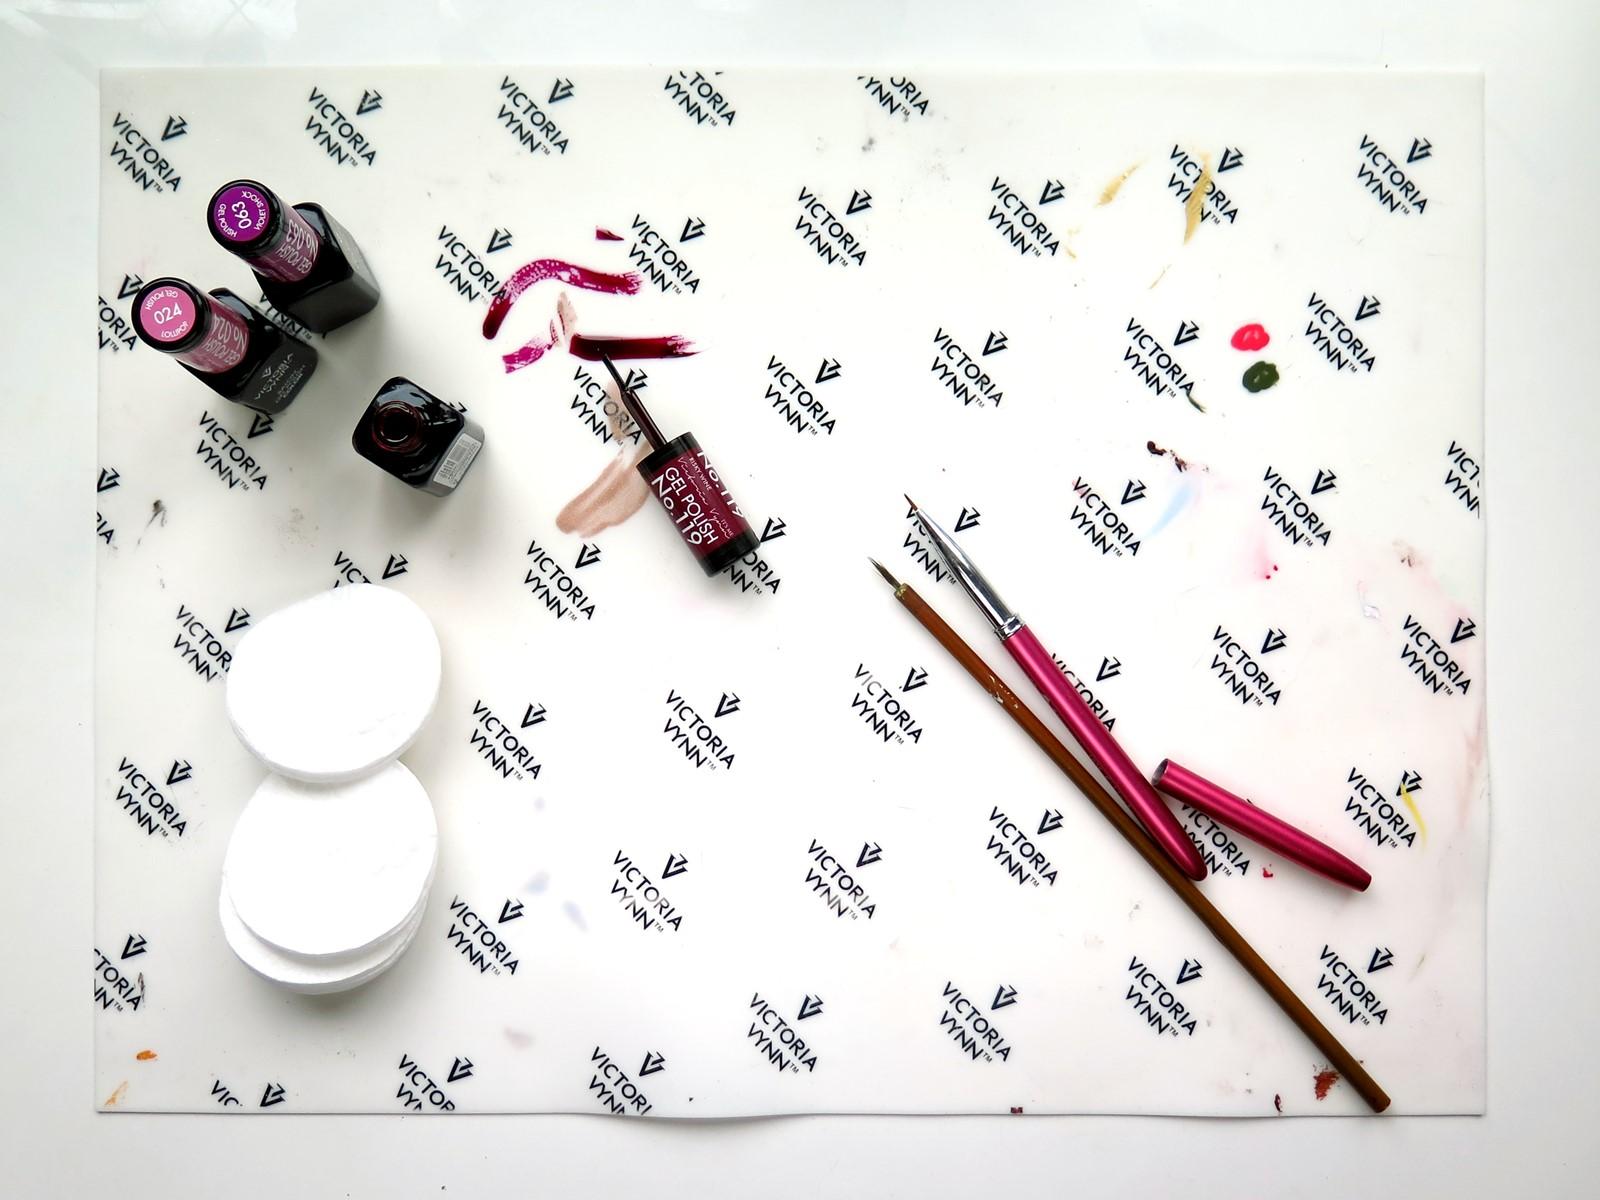 Silikonowa mata Victoria Vynn – recenzja i naklejki na paznokcie DIY